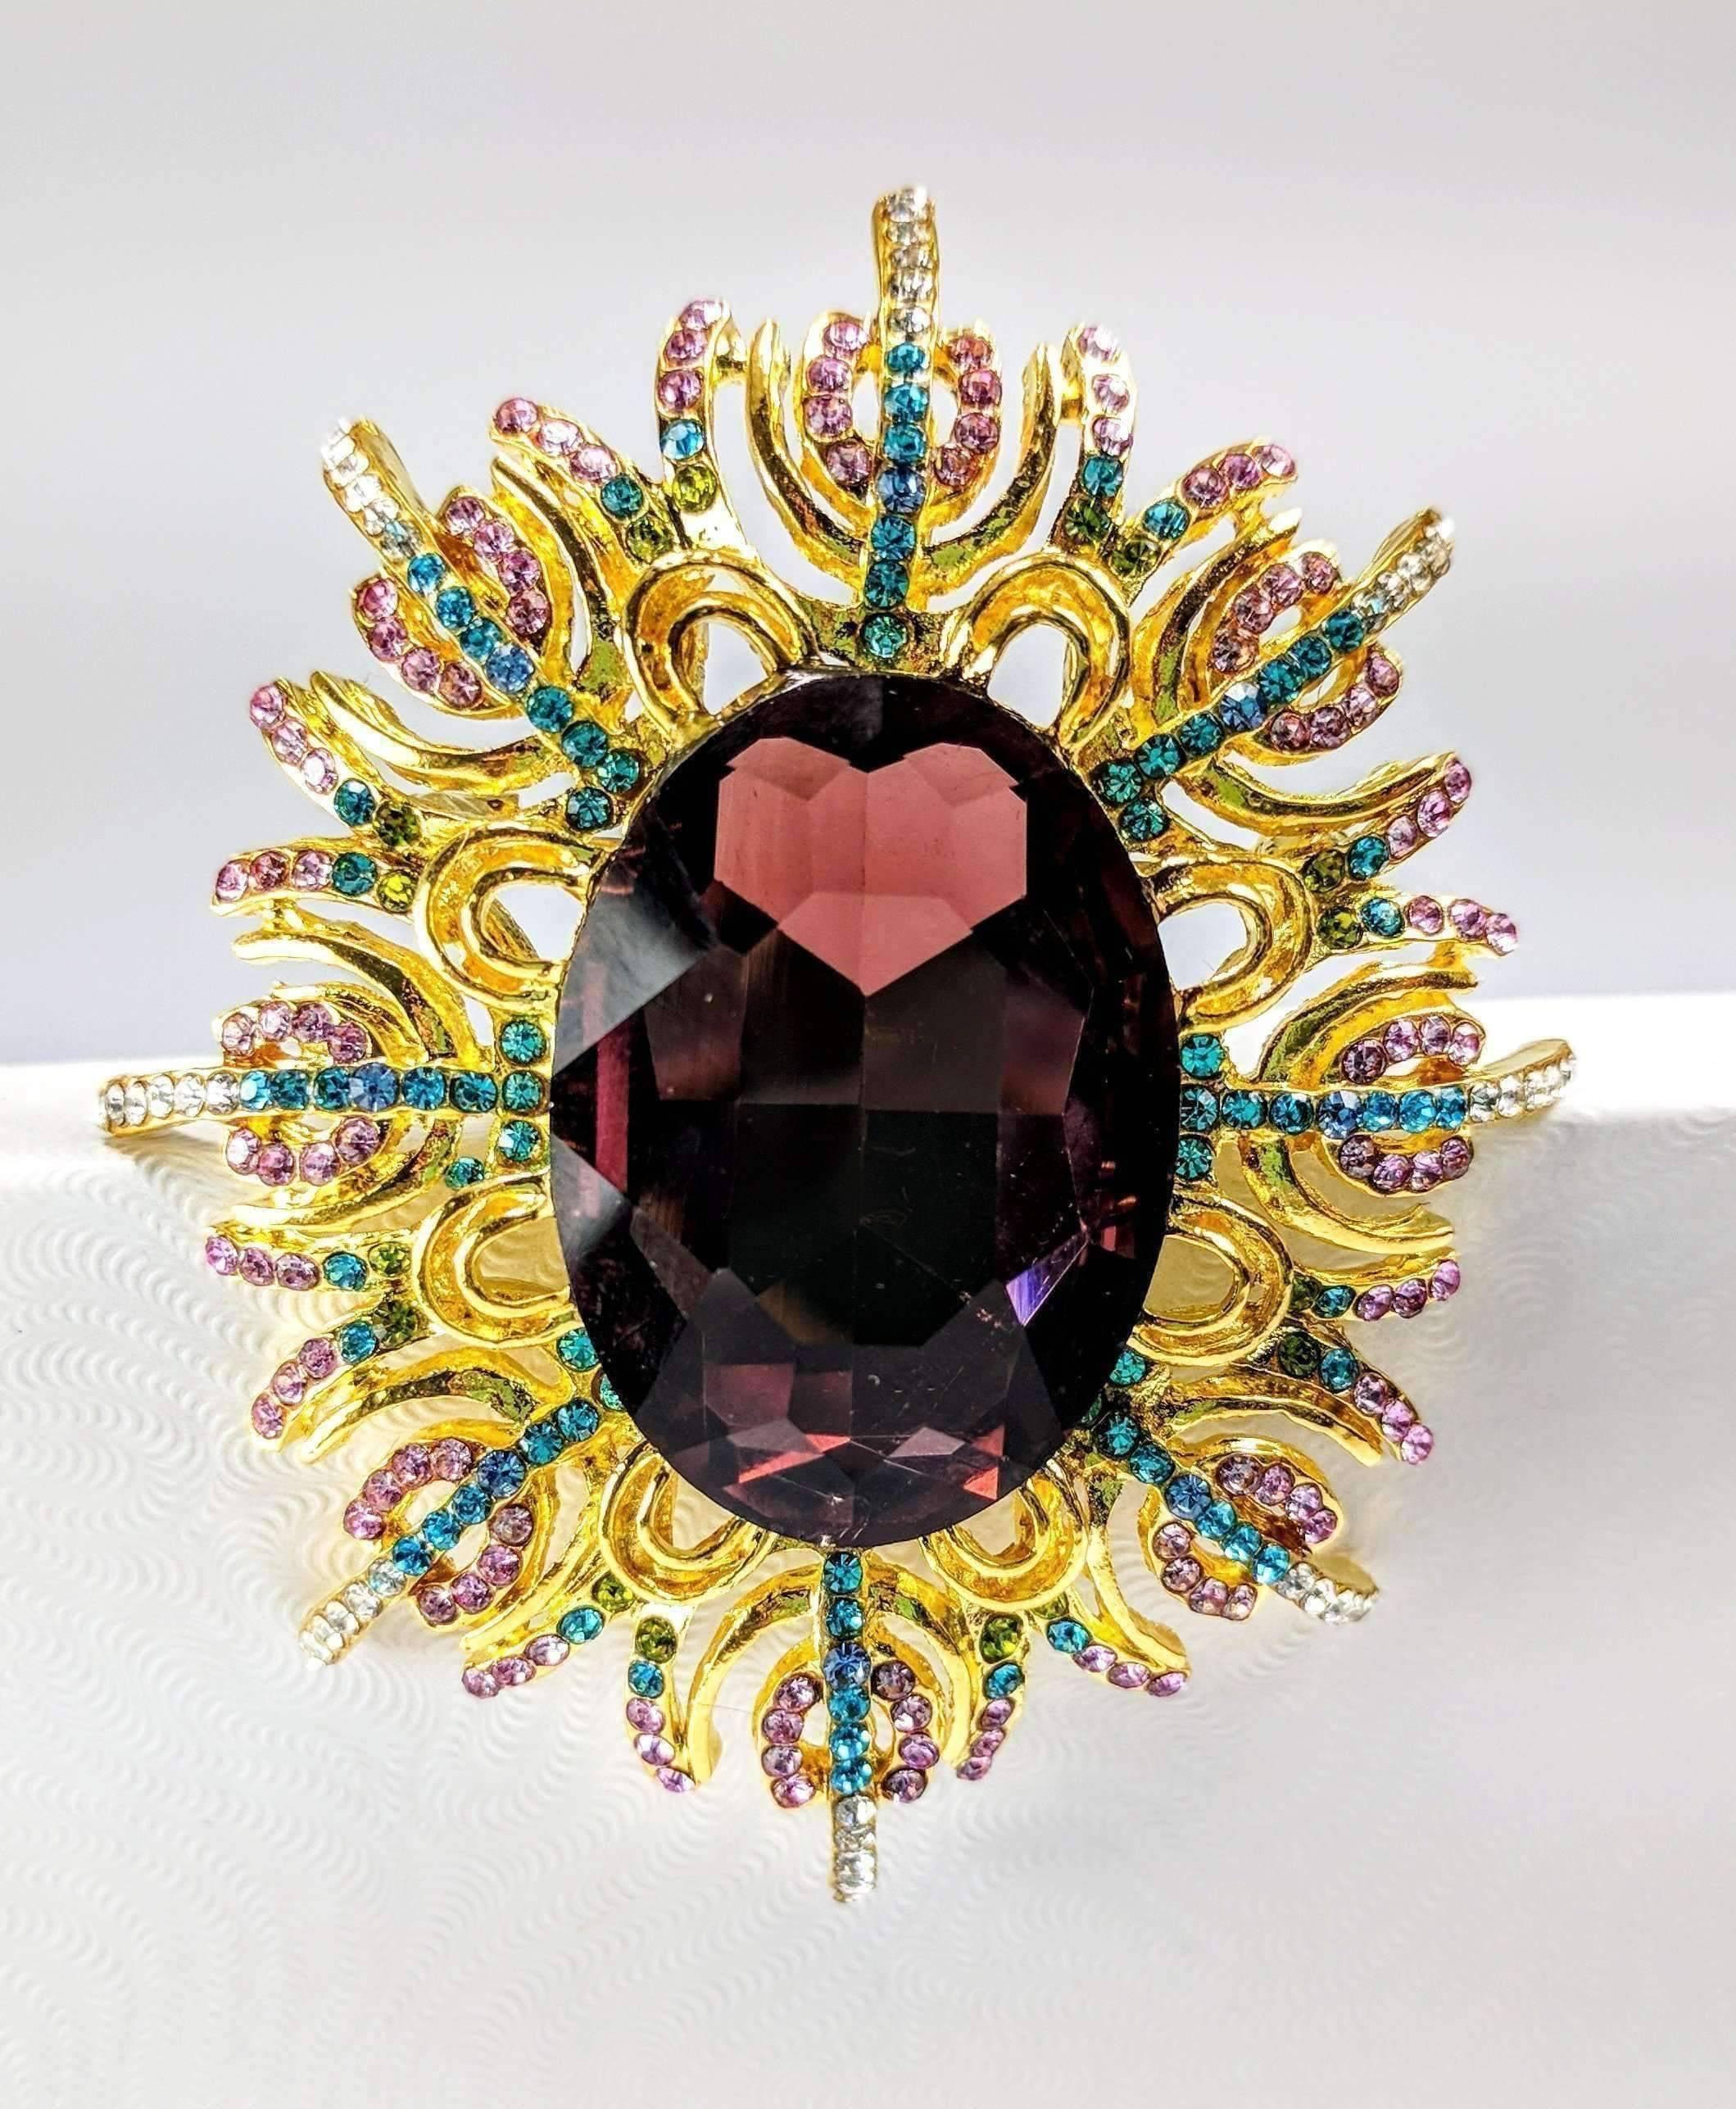 Garden of Beauty Large Crystal Encrusted Brooch Sweater Pin Flower by Feshionn IOBI